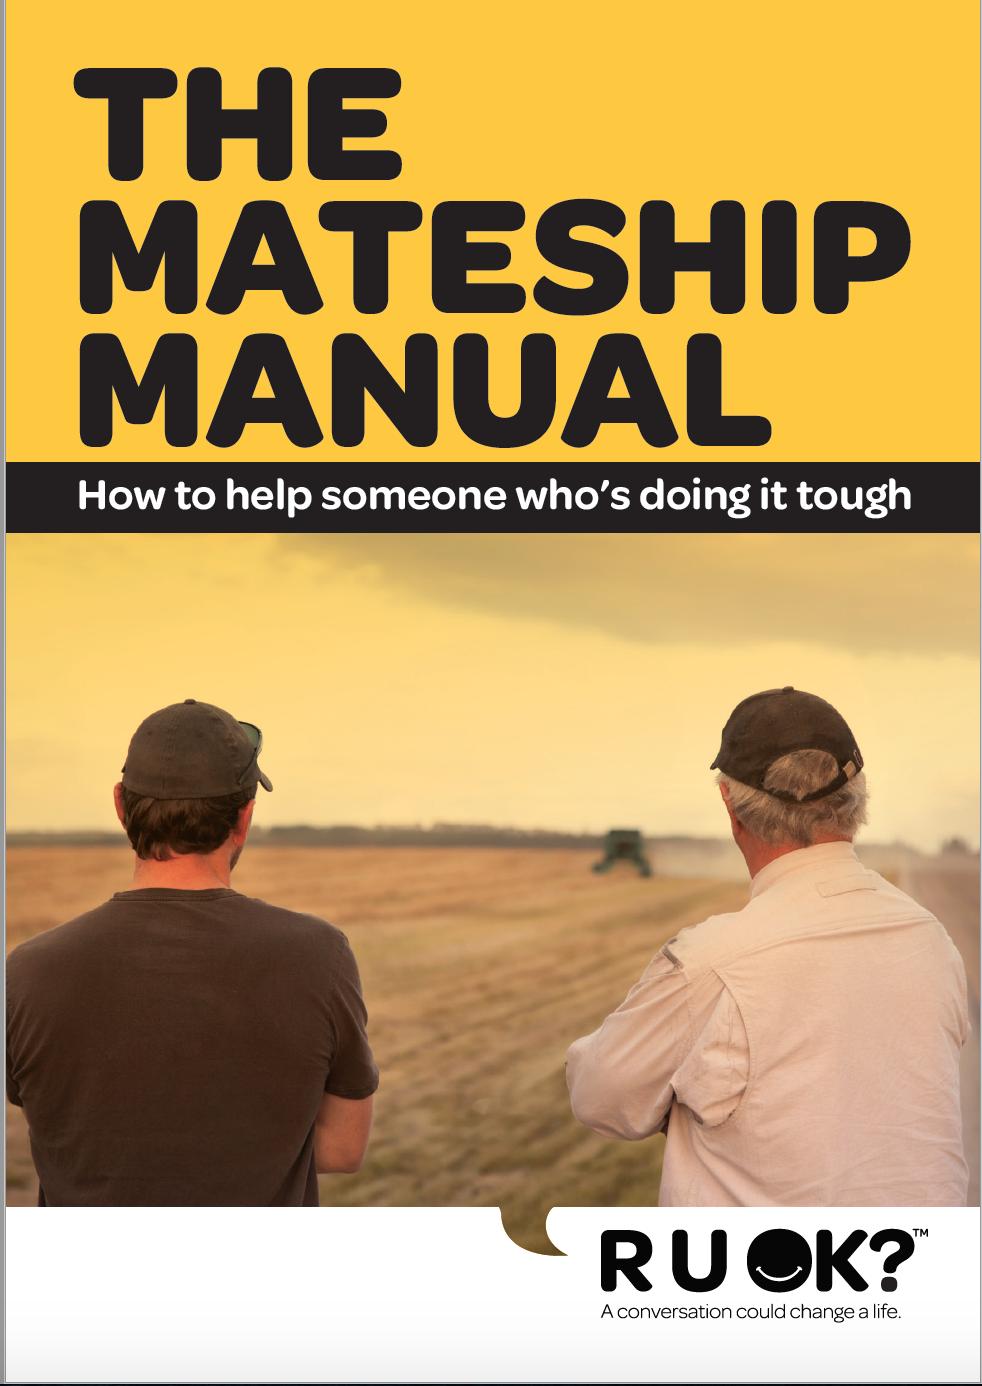 The Mateship Manual